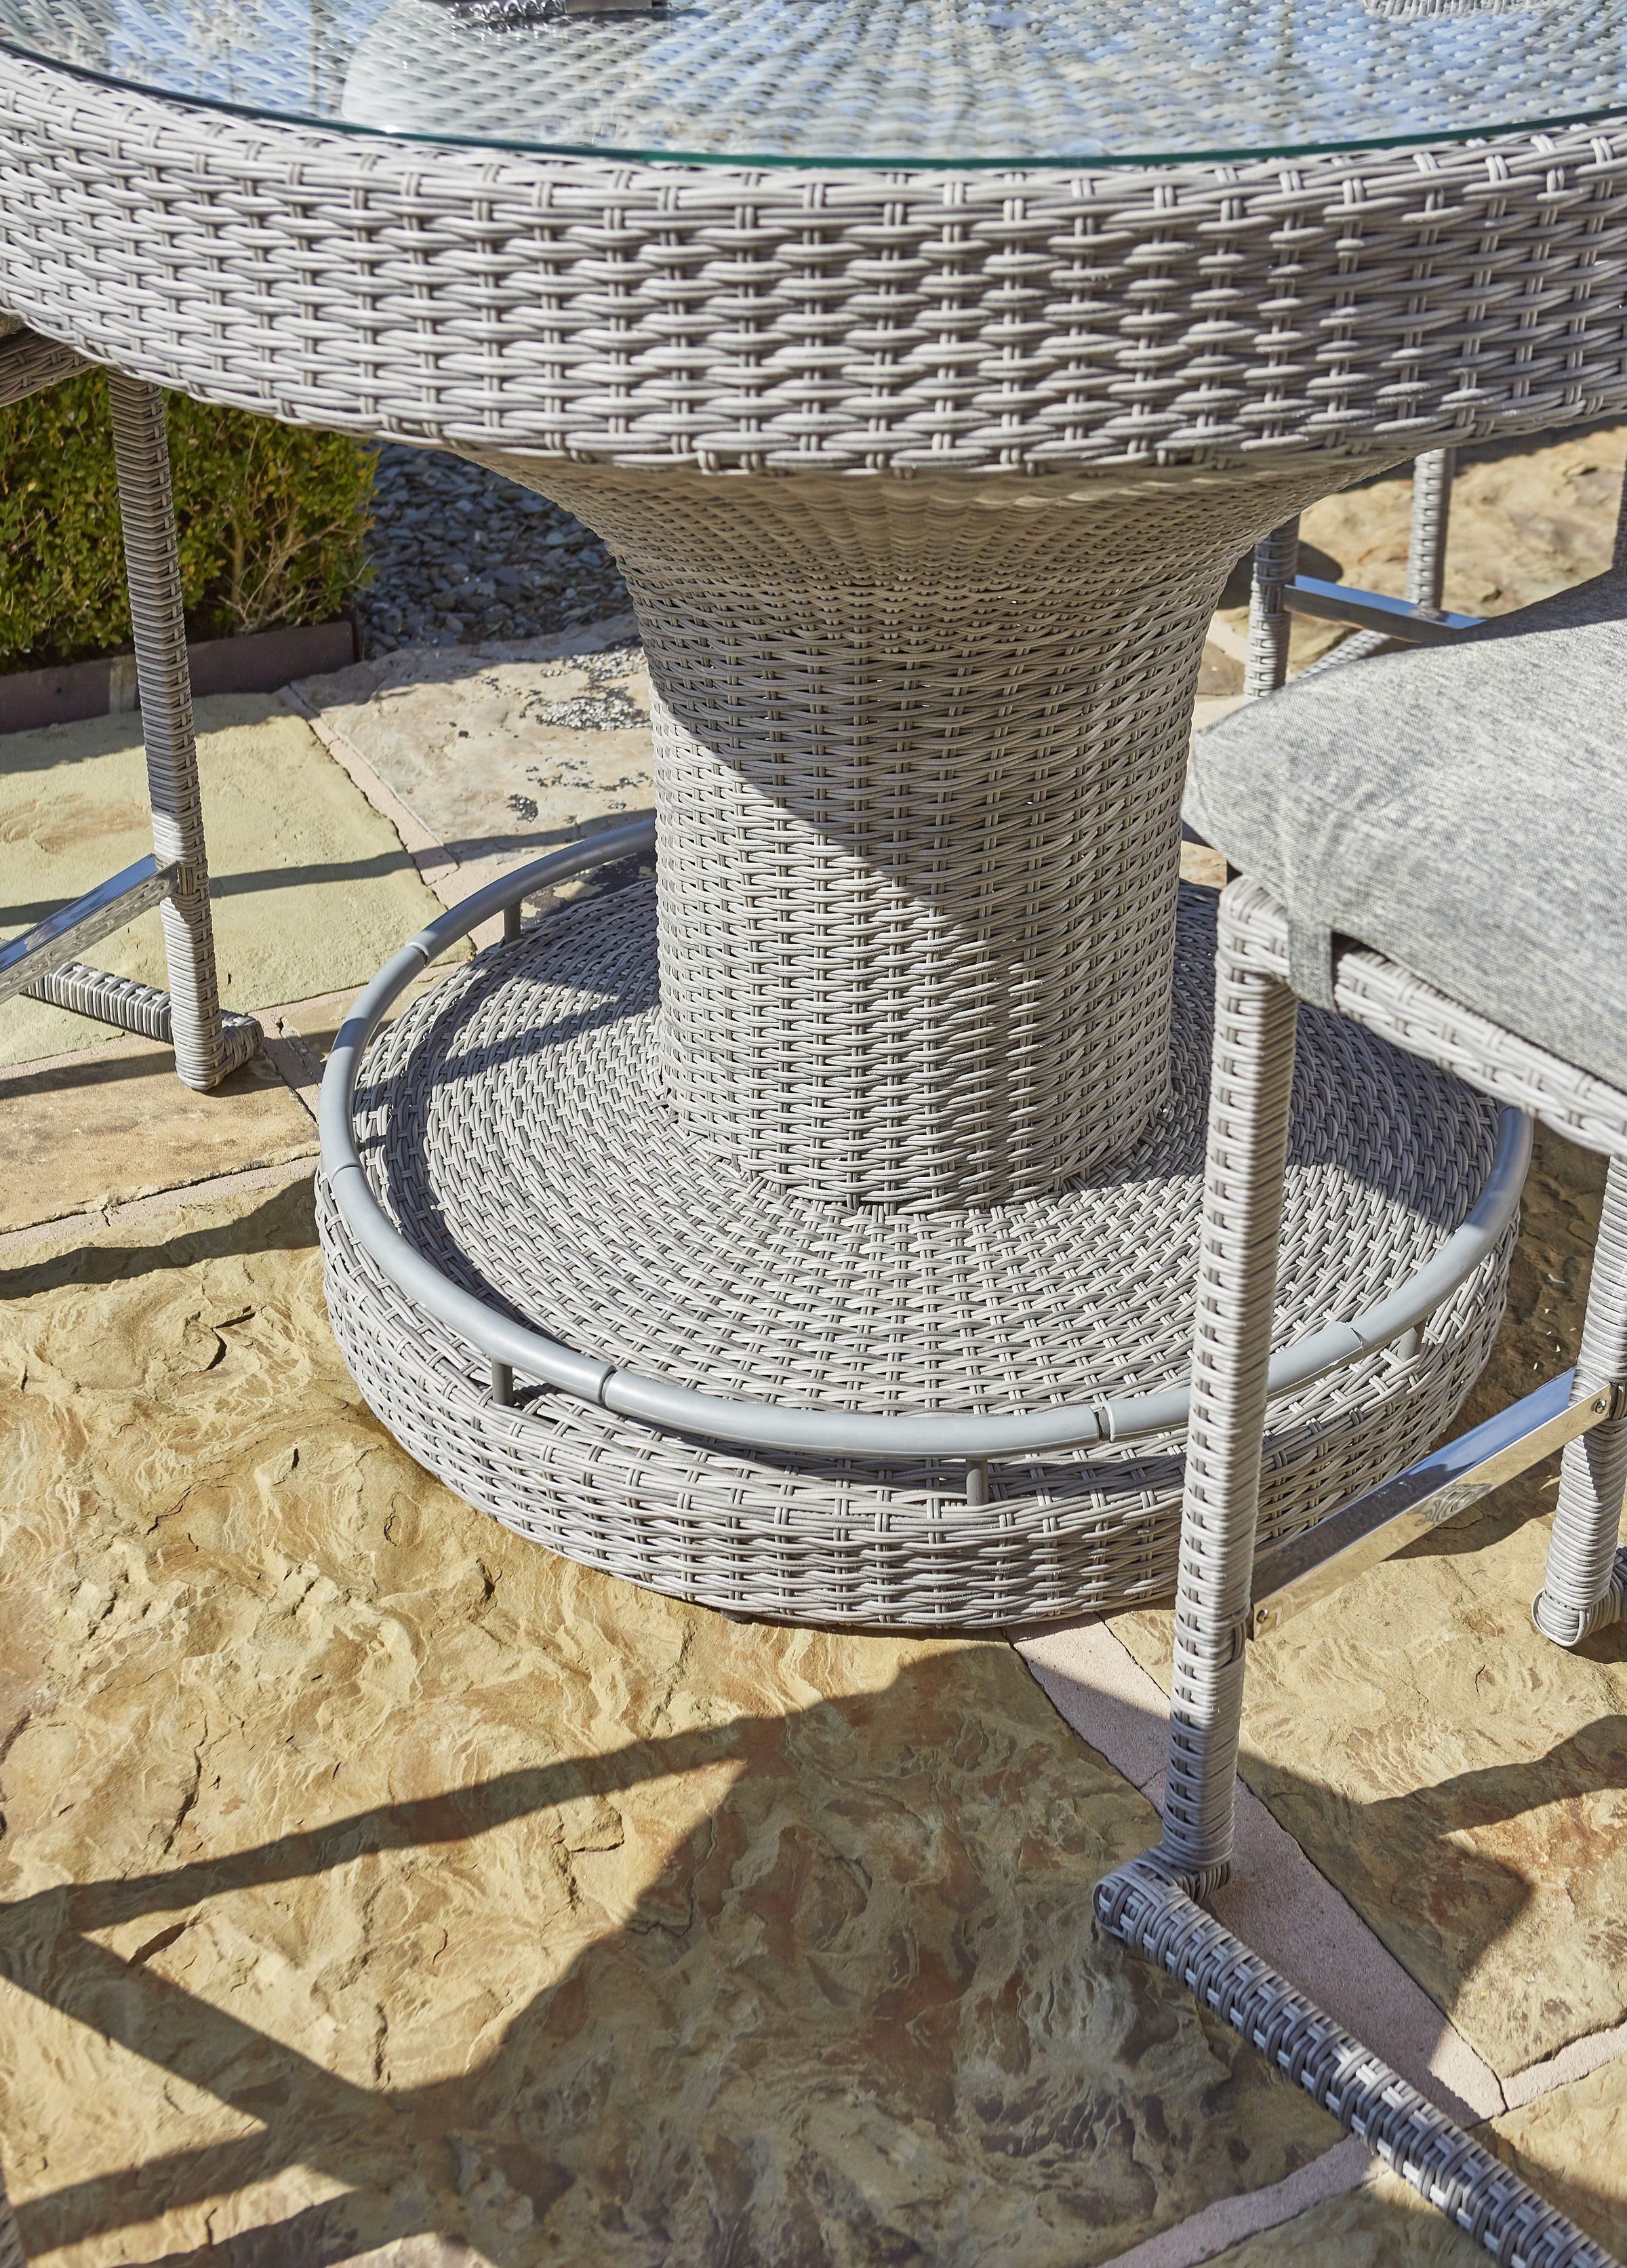 Norcamp Fiesta Round 6-Seat Bar with Ice Bucket